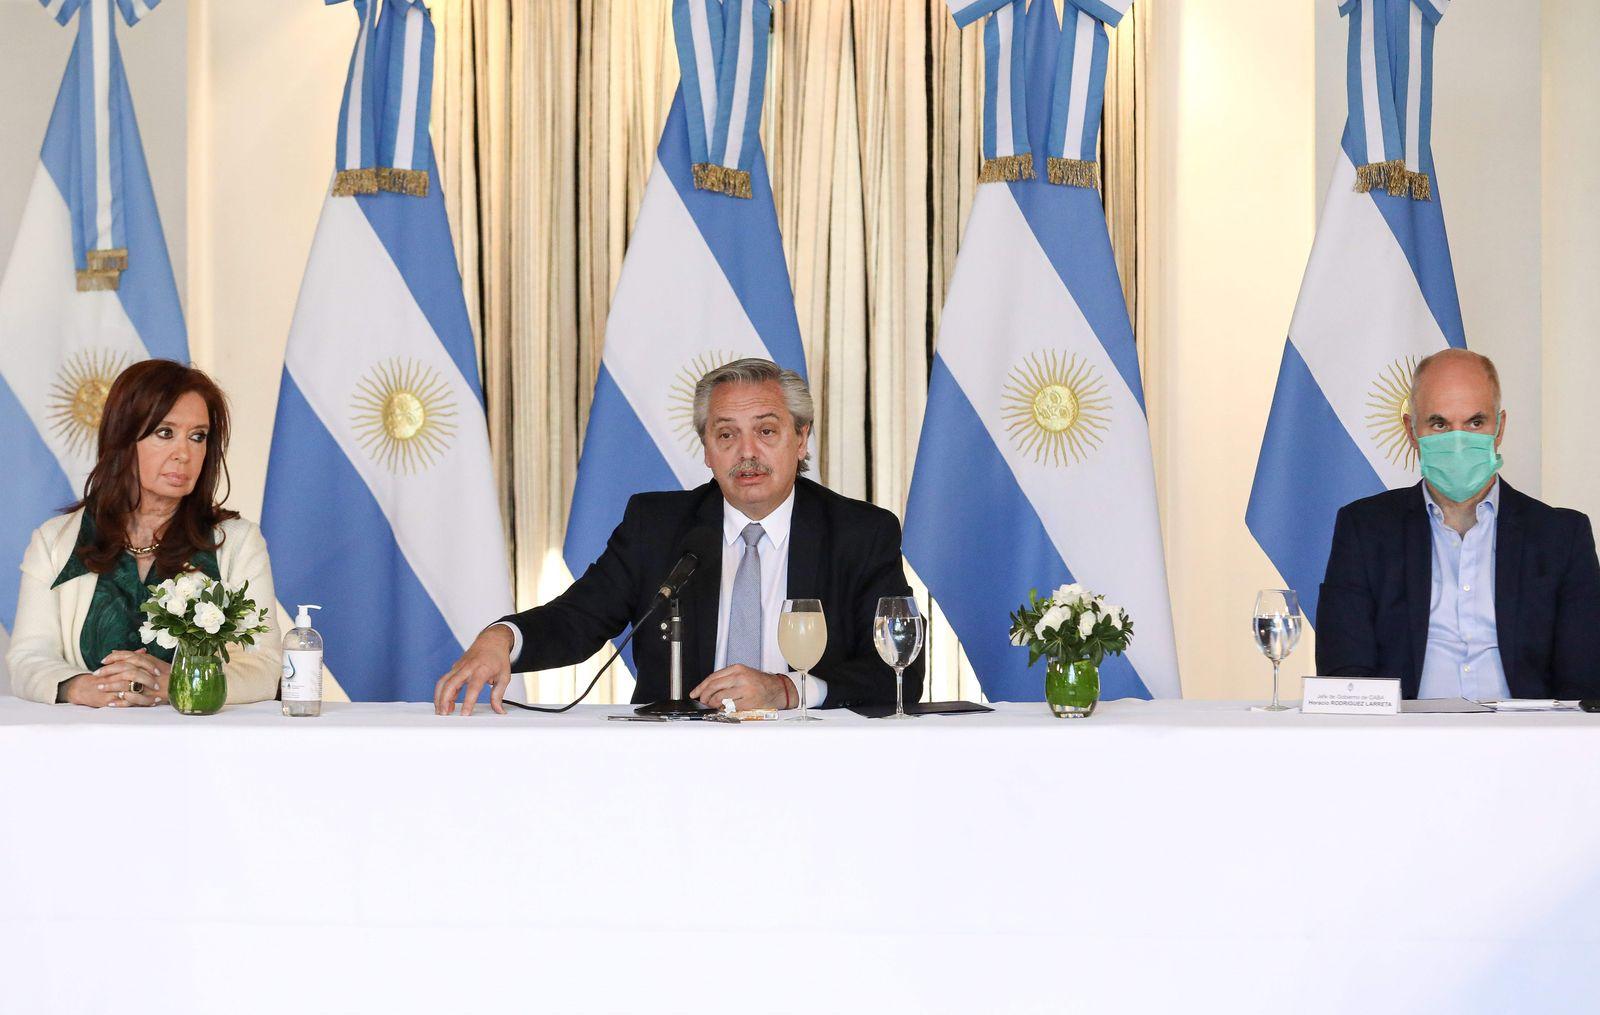 Argentinas Presidency of Argentine President Alberto Fernandez